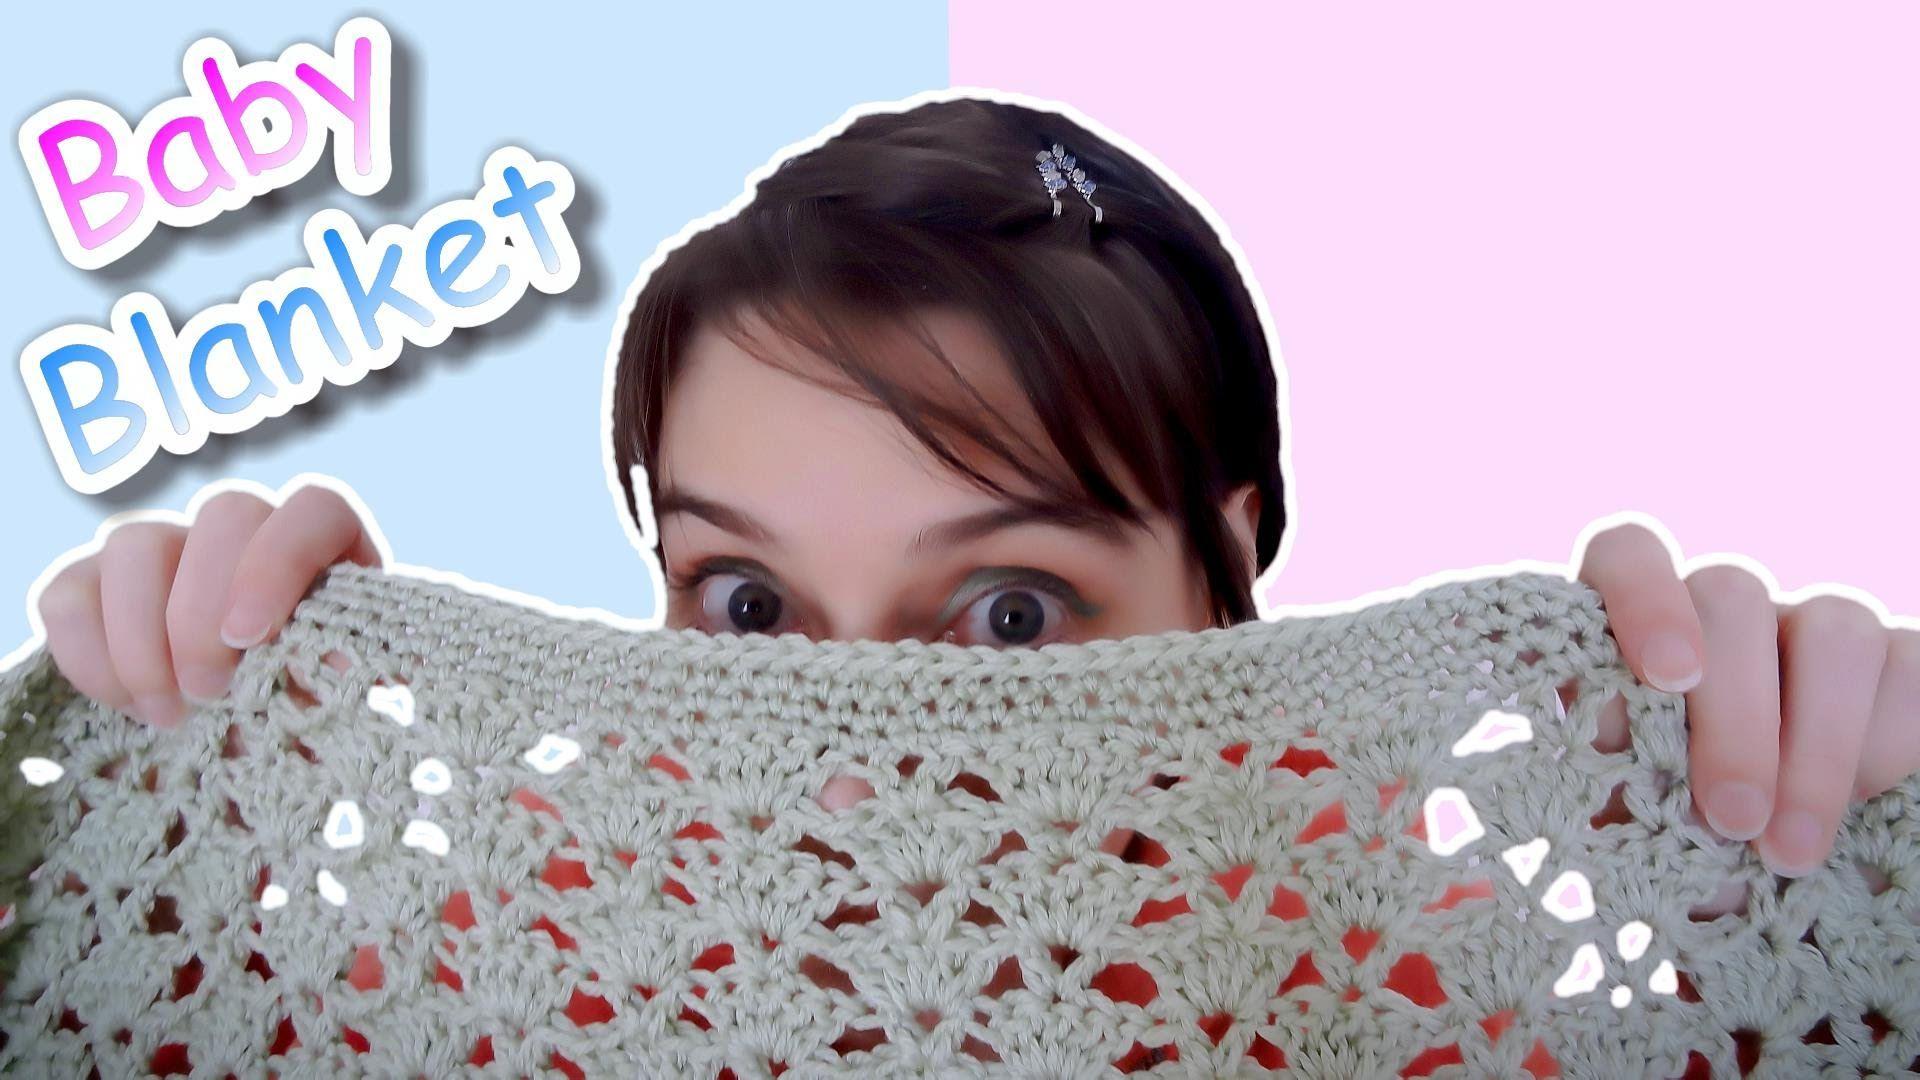 Crochet Baby Blanket - Easy Fan Stitch Pattern (Uses about 3 skeins ...